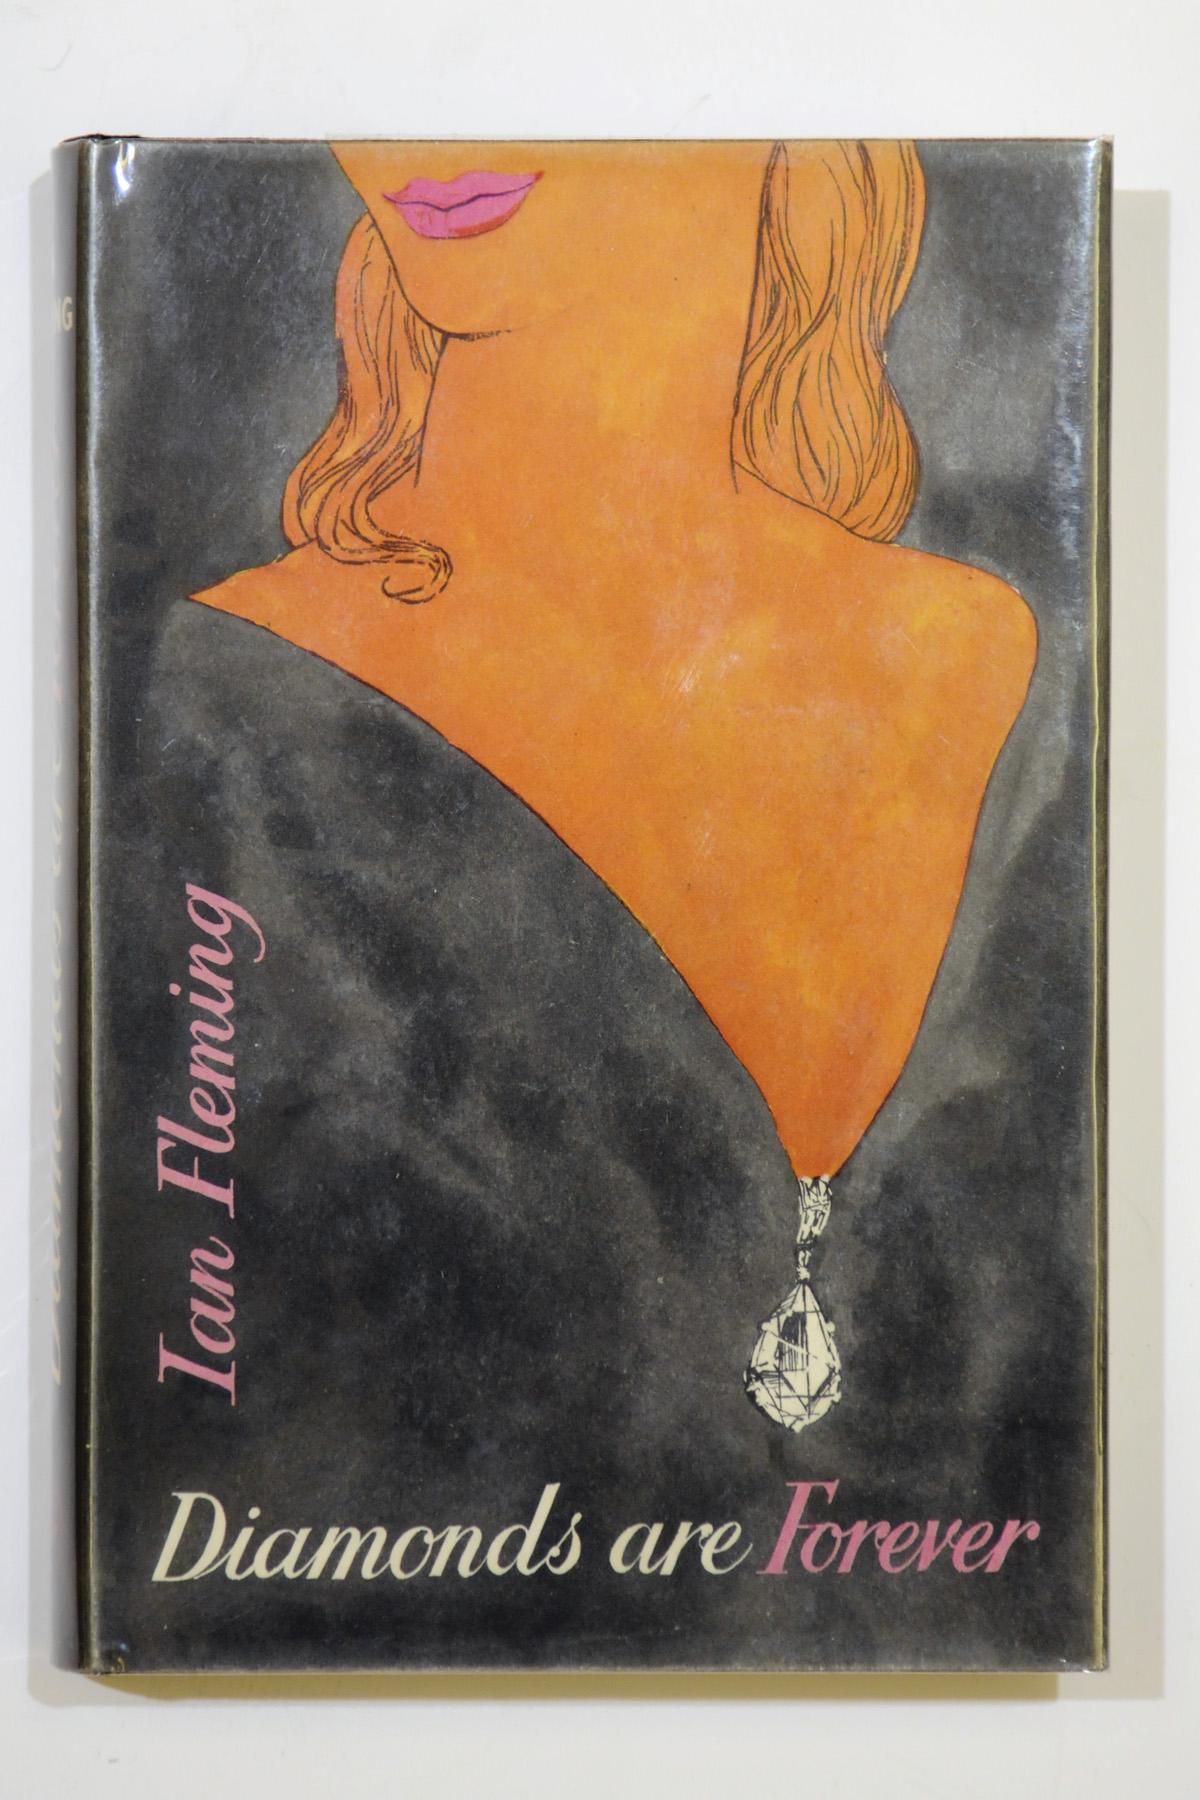 FLEMING, Ian (1908-1964). Diam